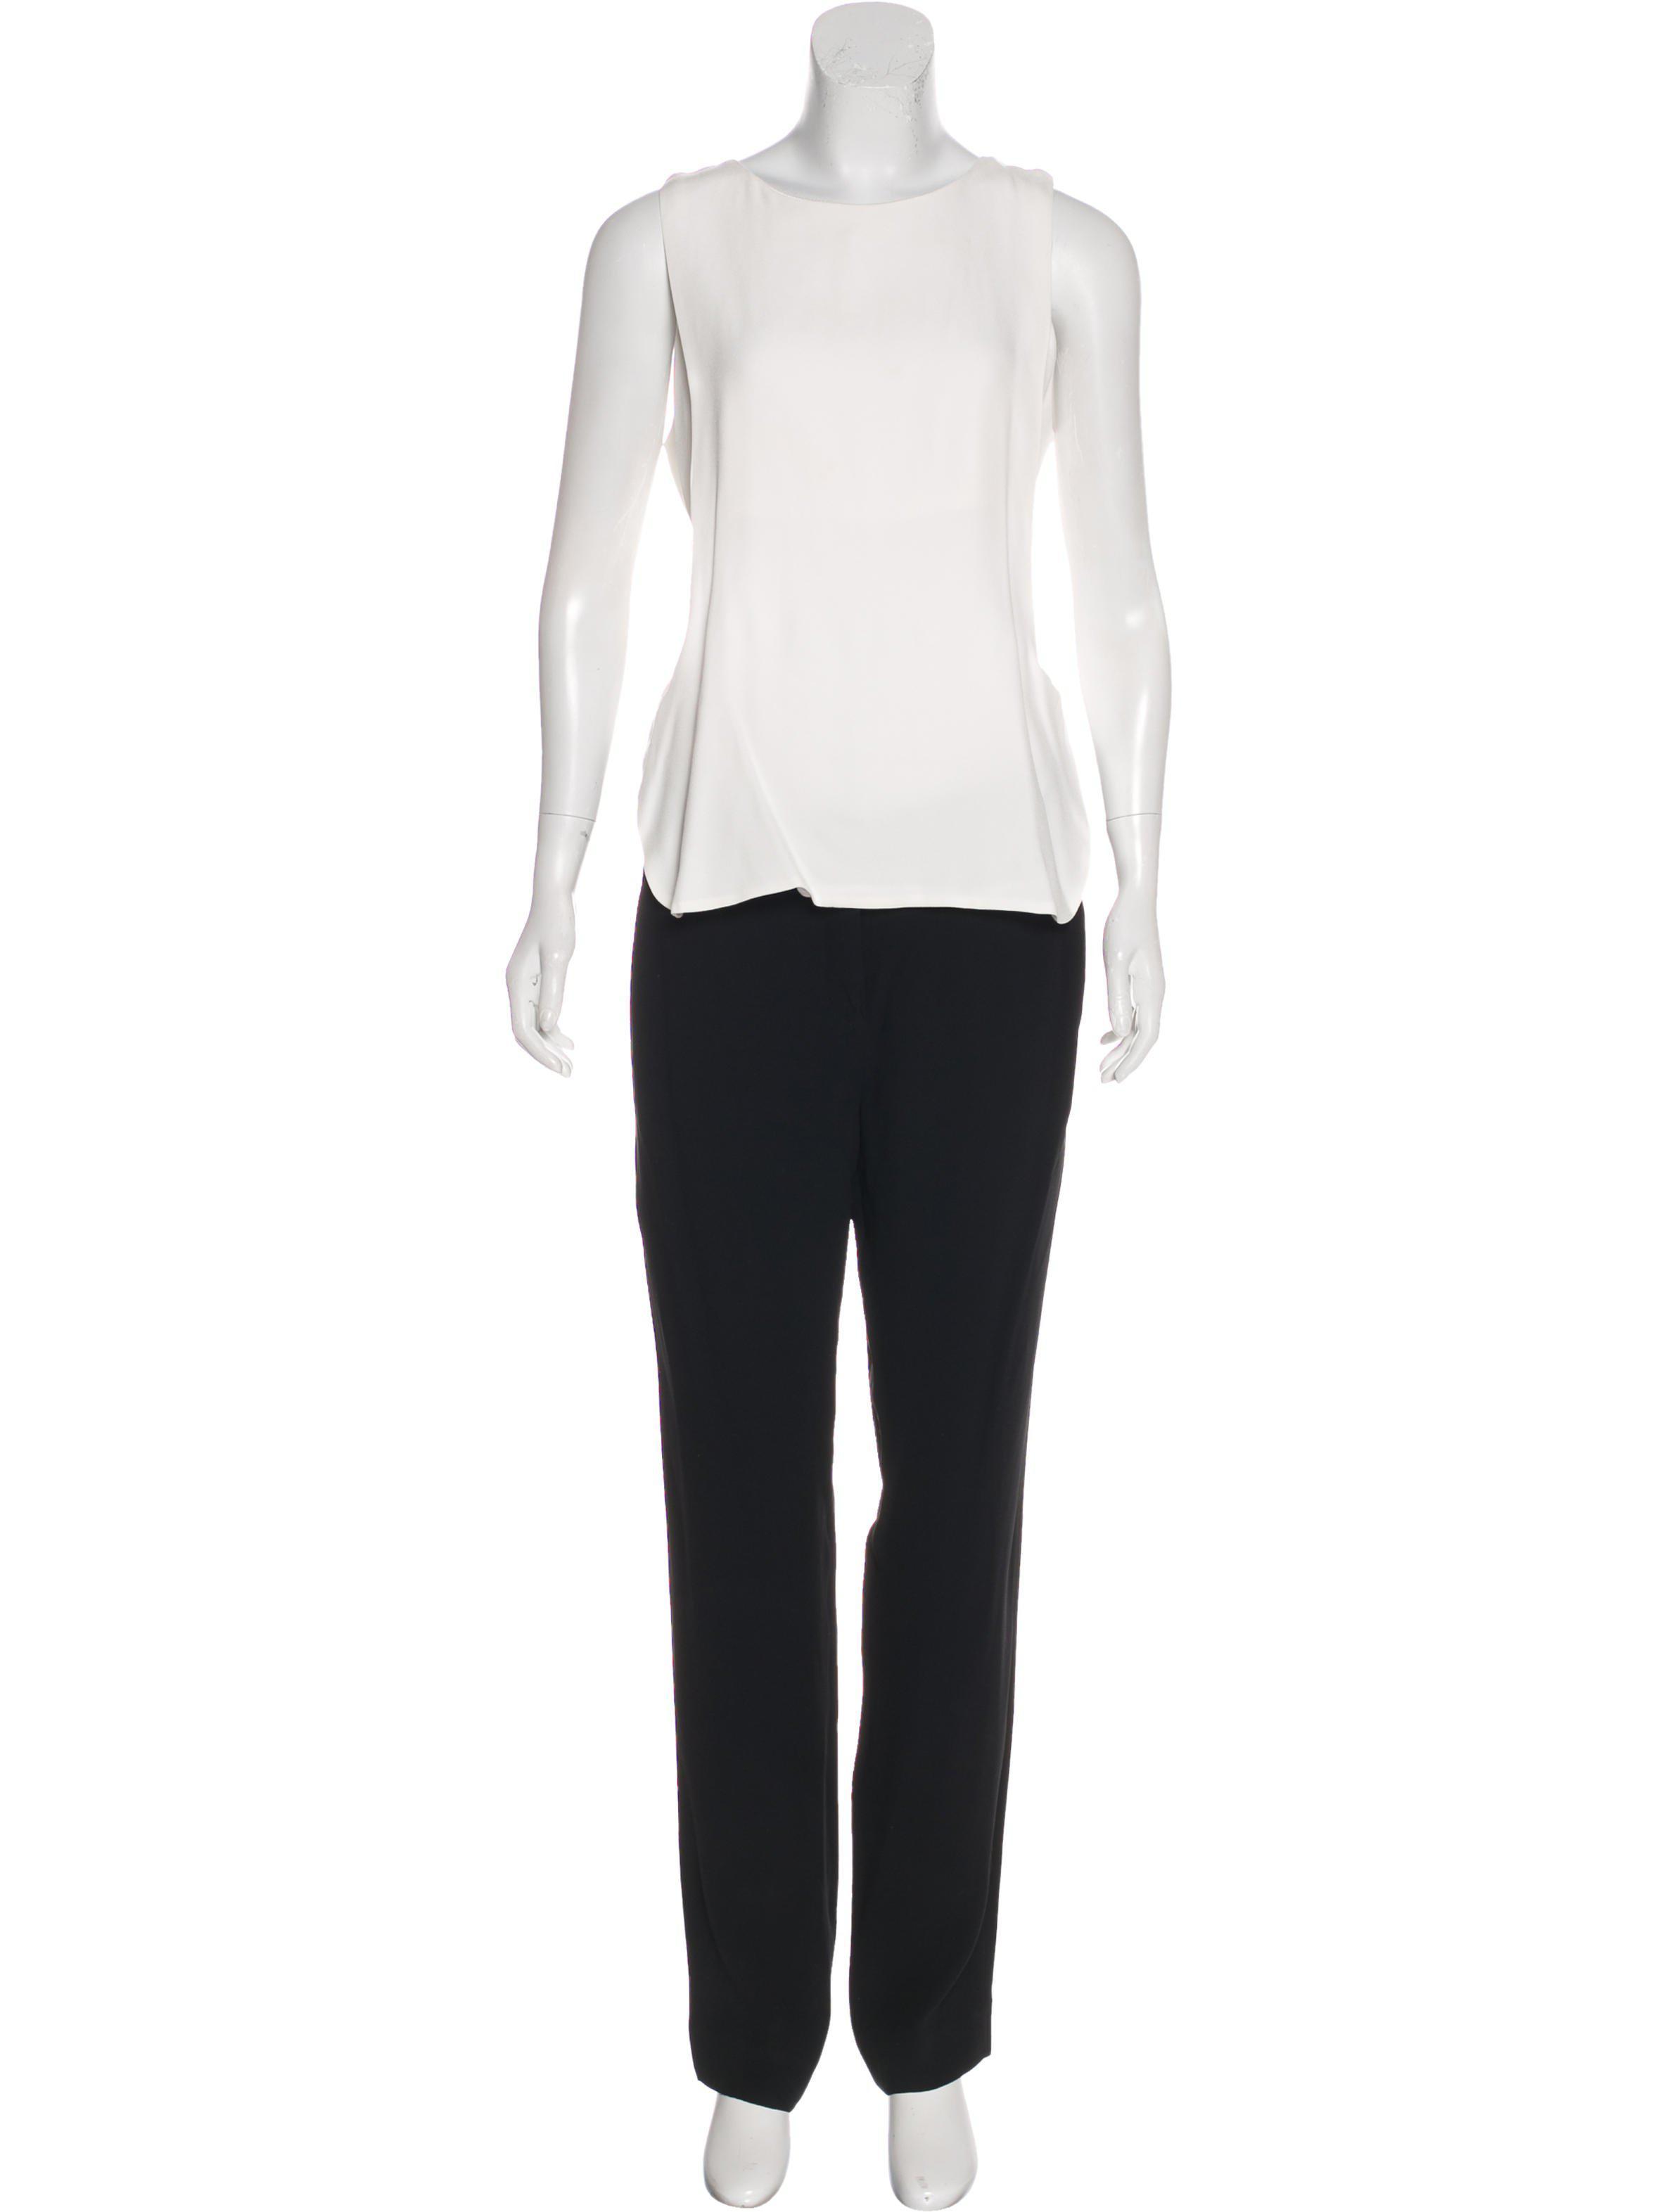 8c703a2c0511 A.L.C. - White Sleeveless Colorblock Jumpsuit - Lyst. View fullscreen